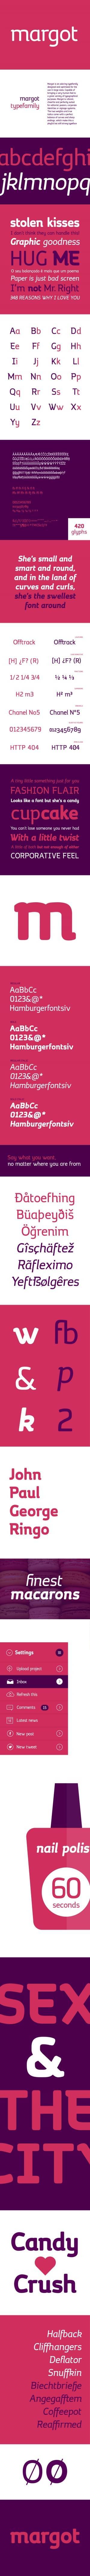 Margot Free Font on Behance